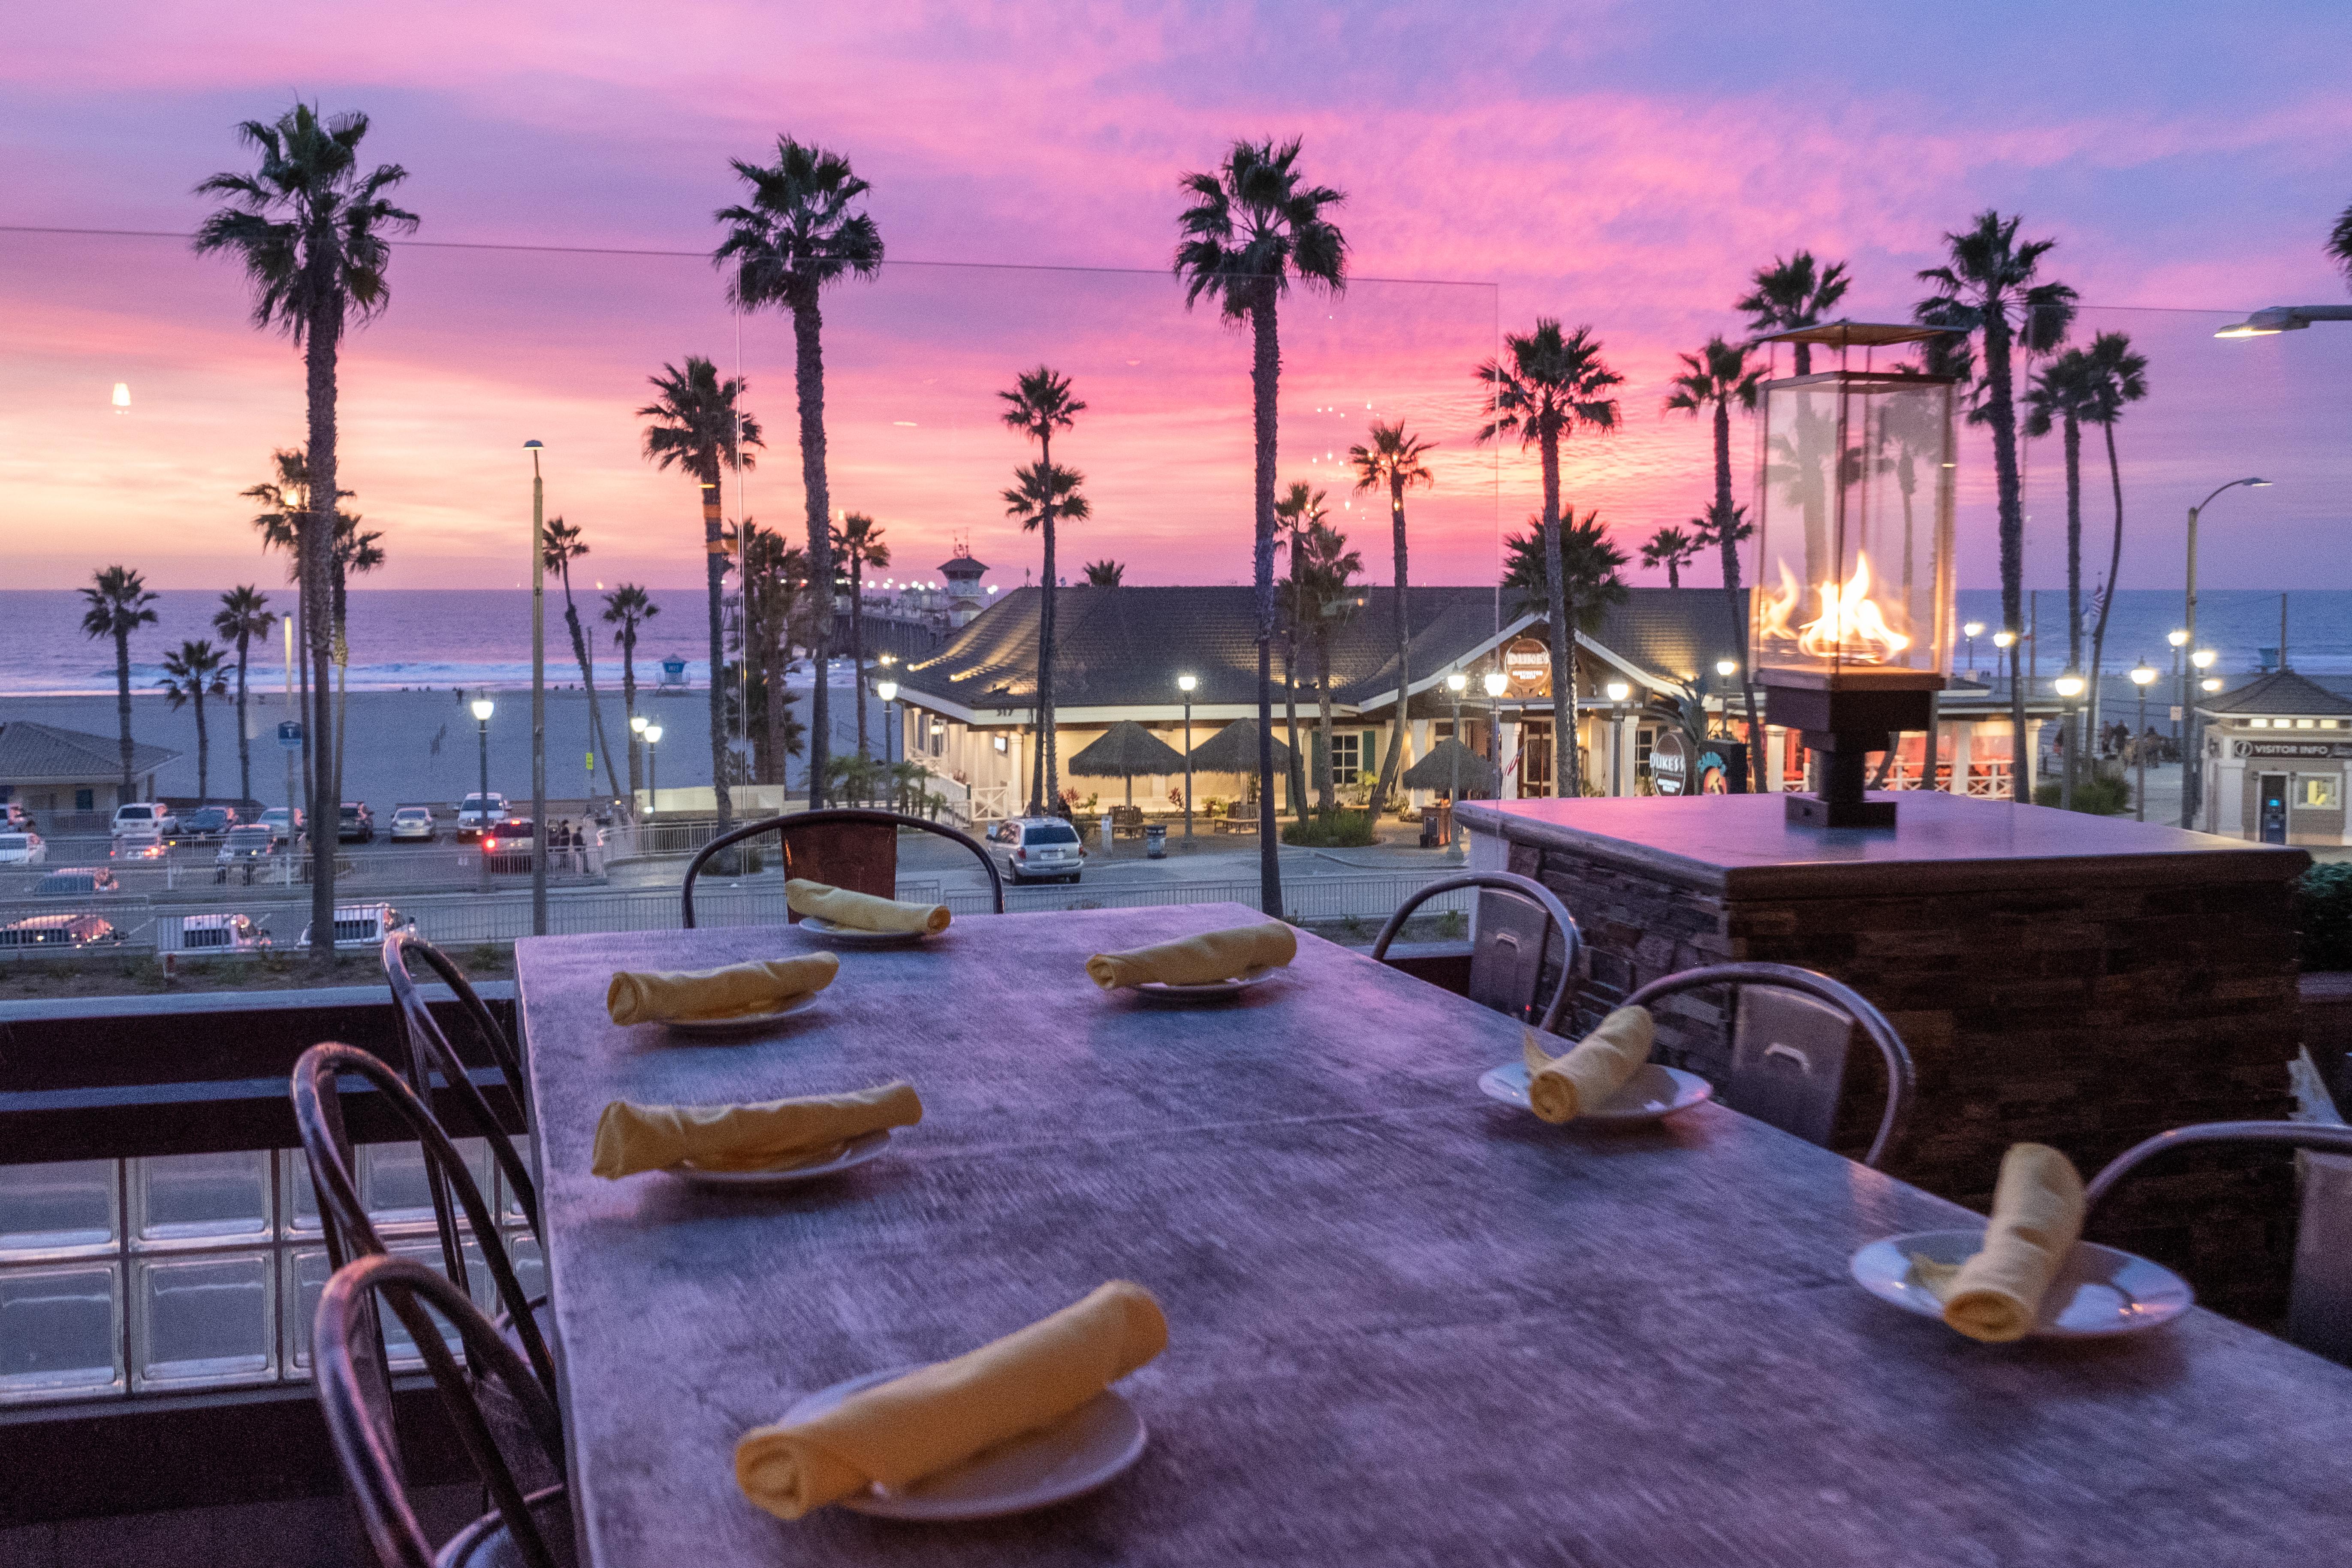 Outdoor Seating Restaurants In Huntington Beach